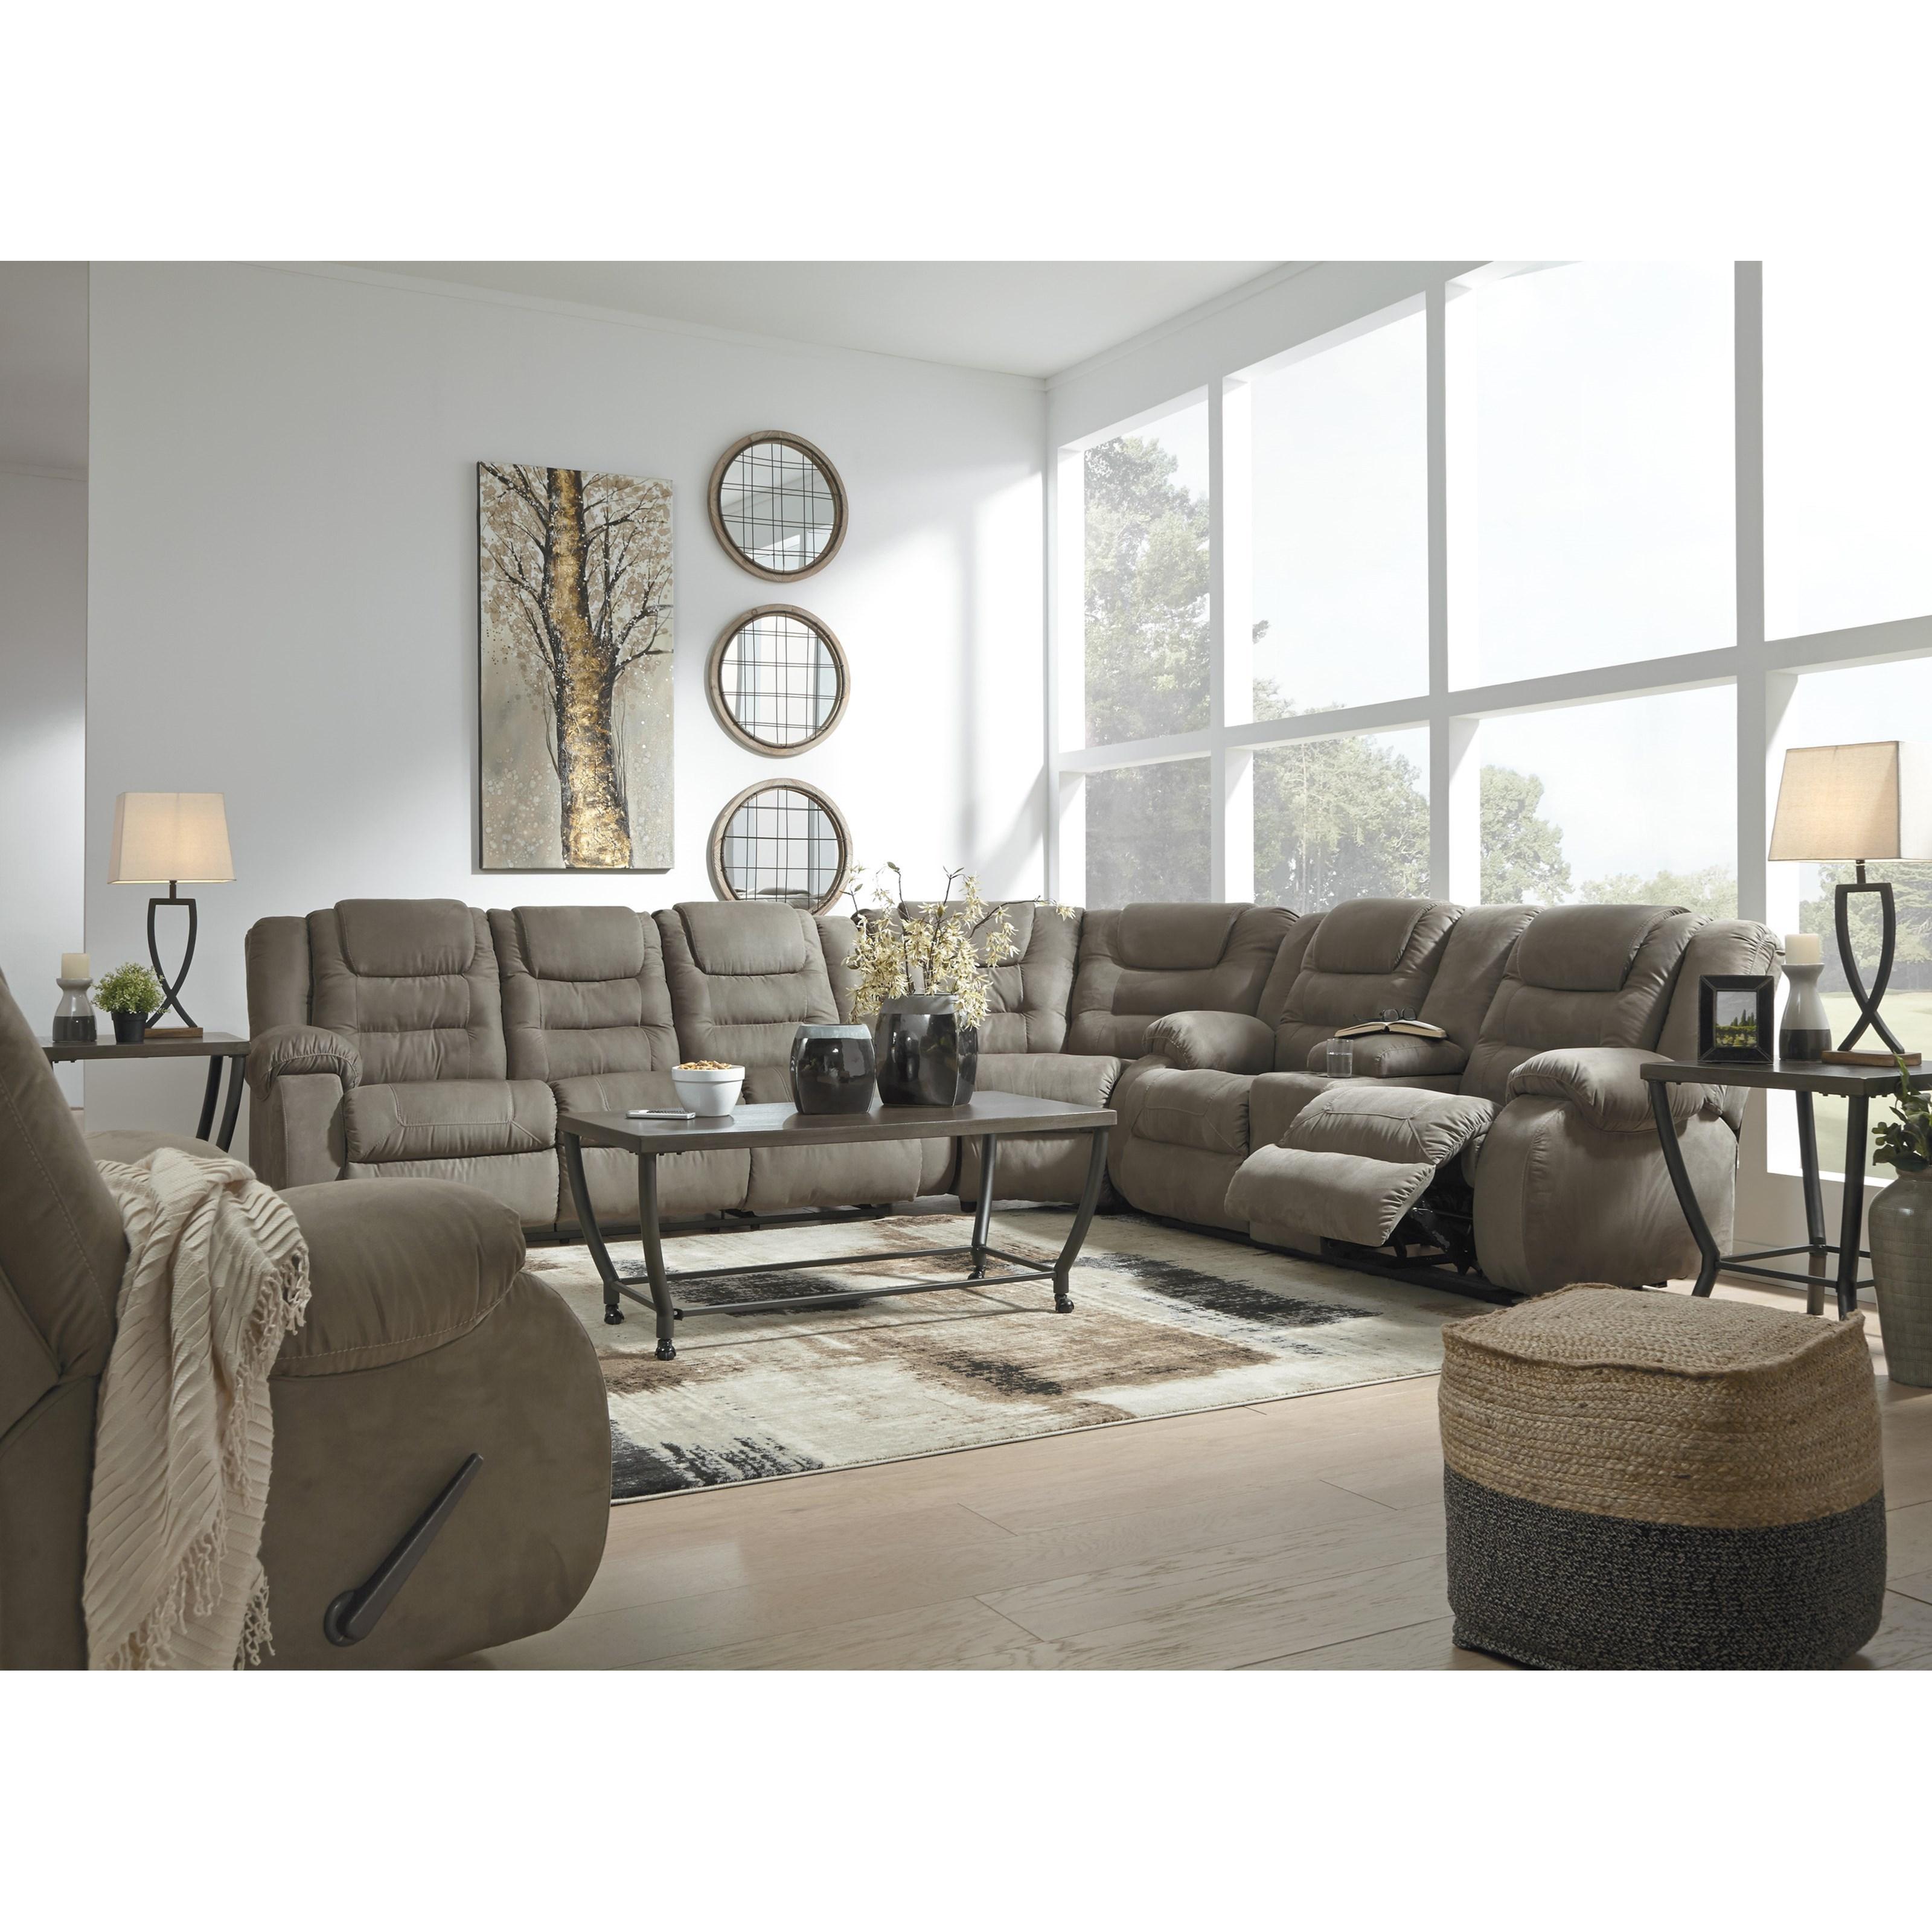 Signature Design By Ashley Segburg Reclining Living Room